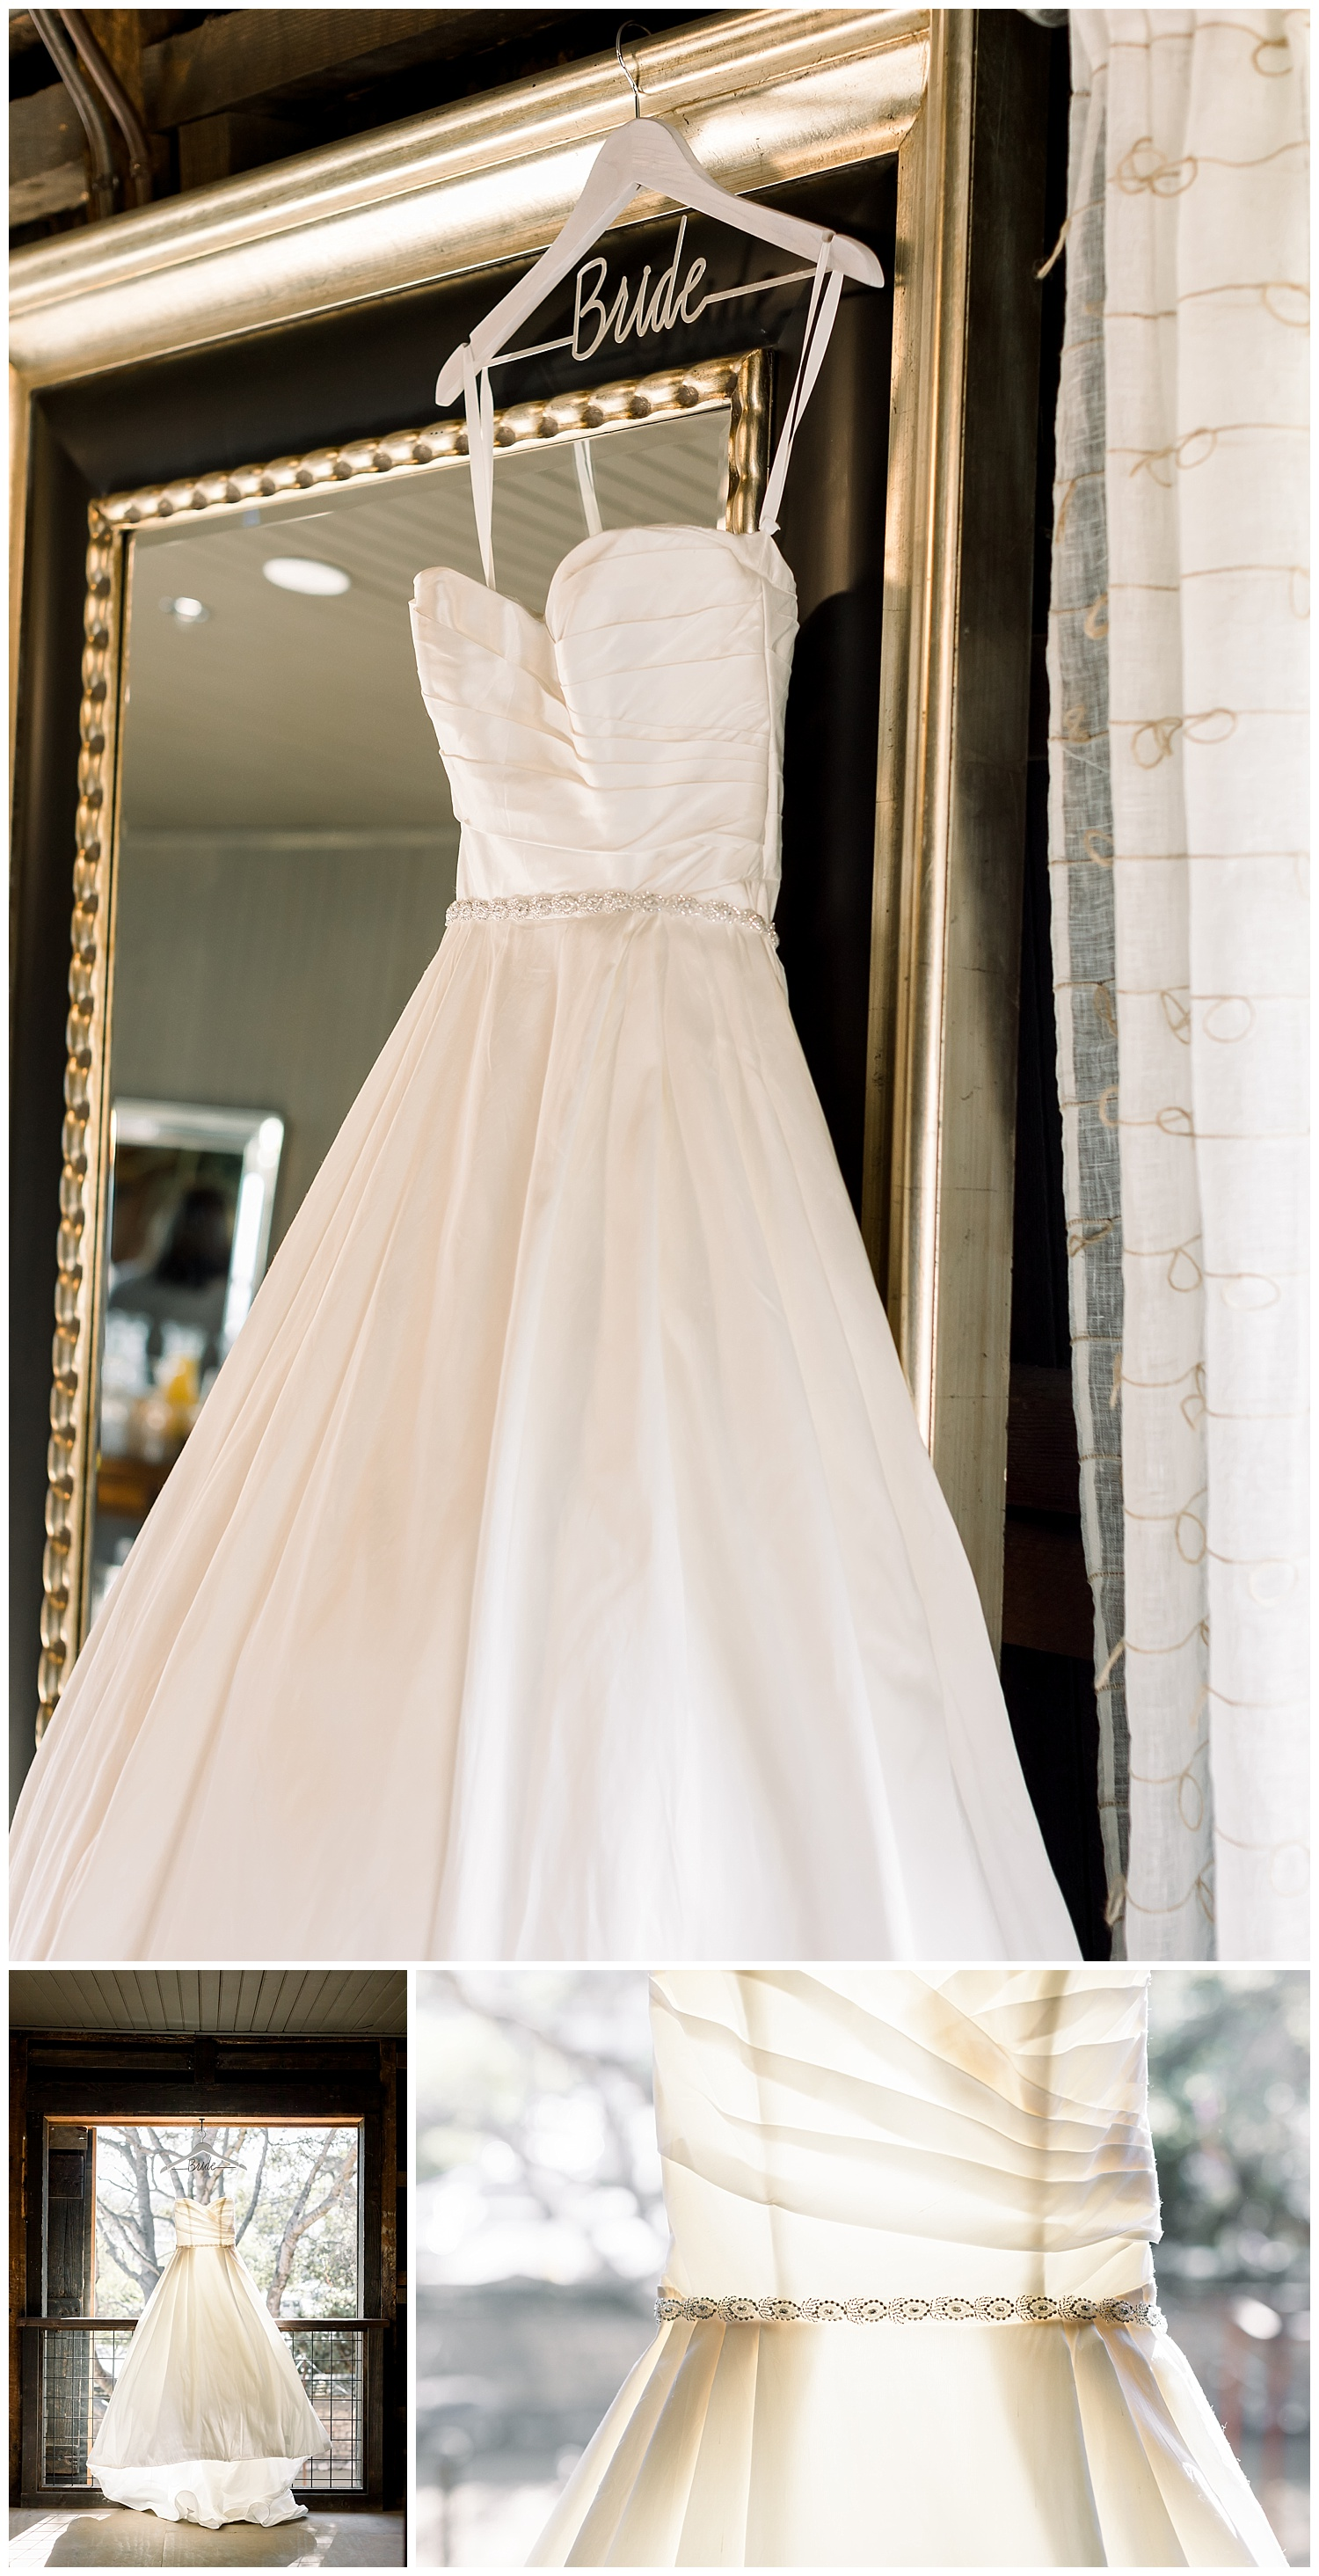 the-barns-wedding-gown-photo-agsphotoart-epiphany-bride.jpg